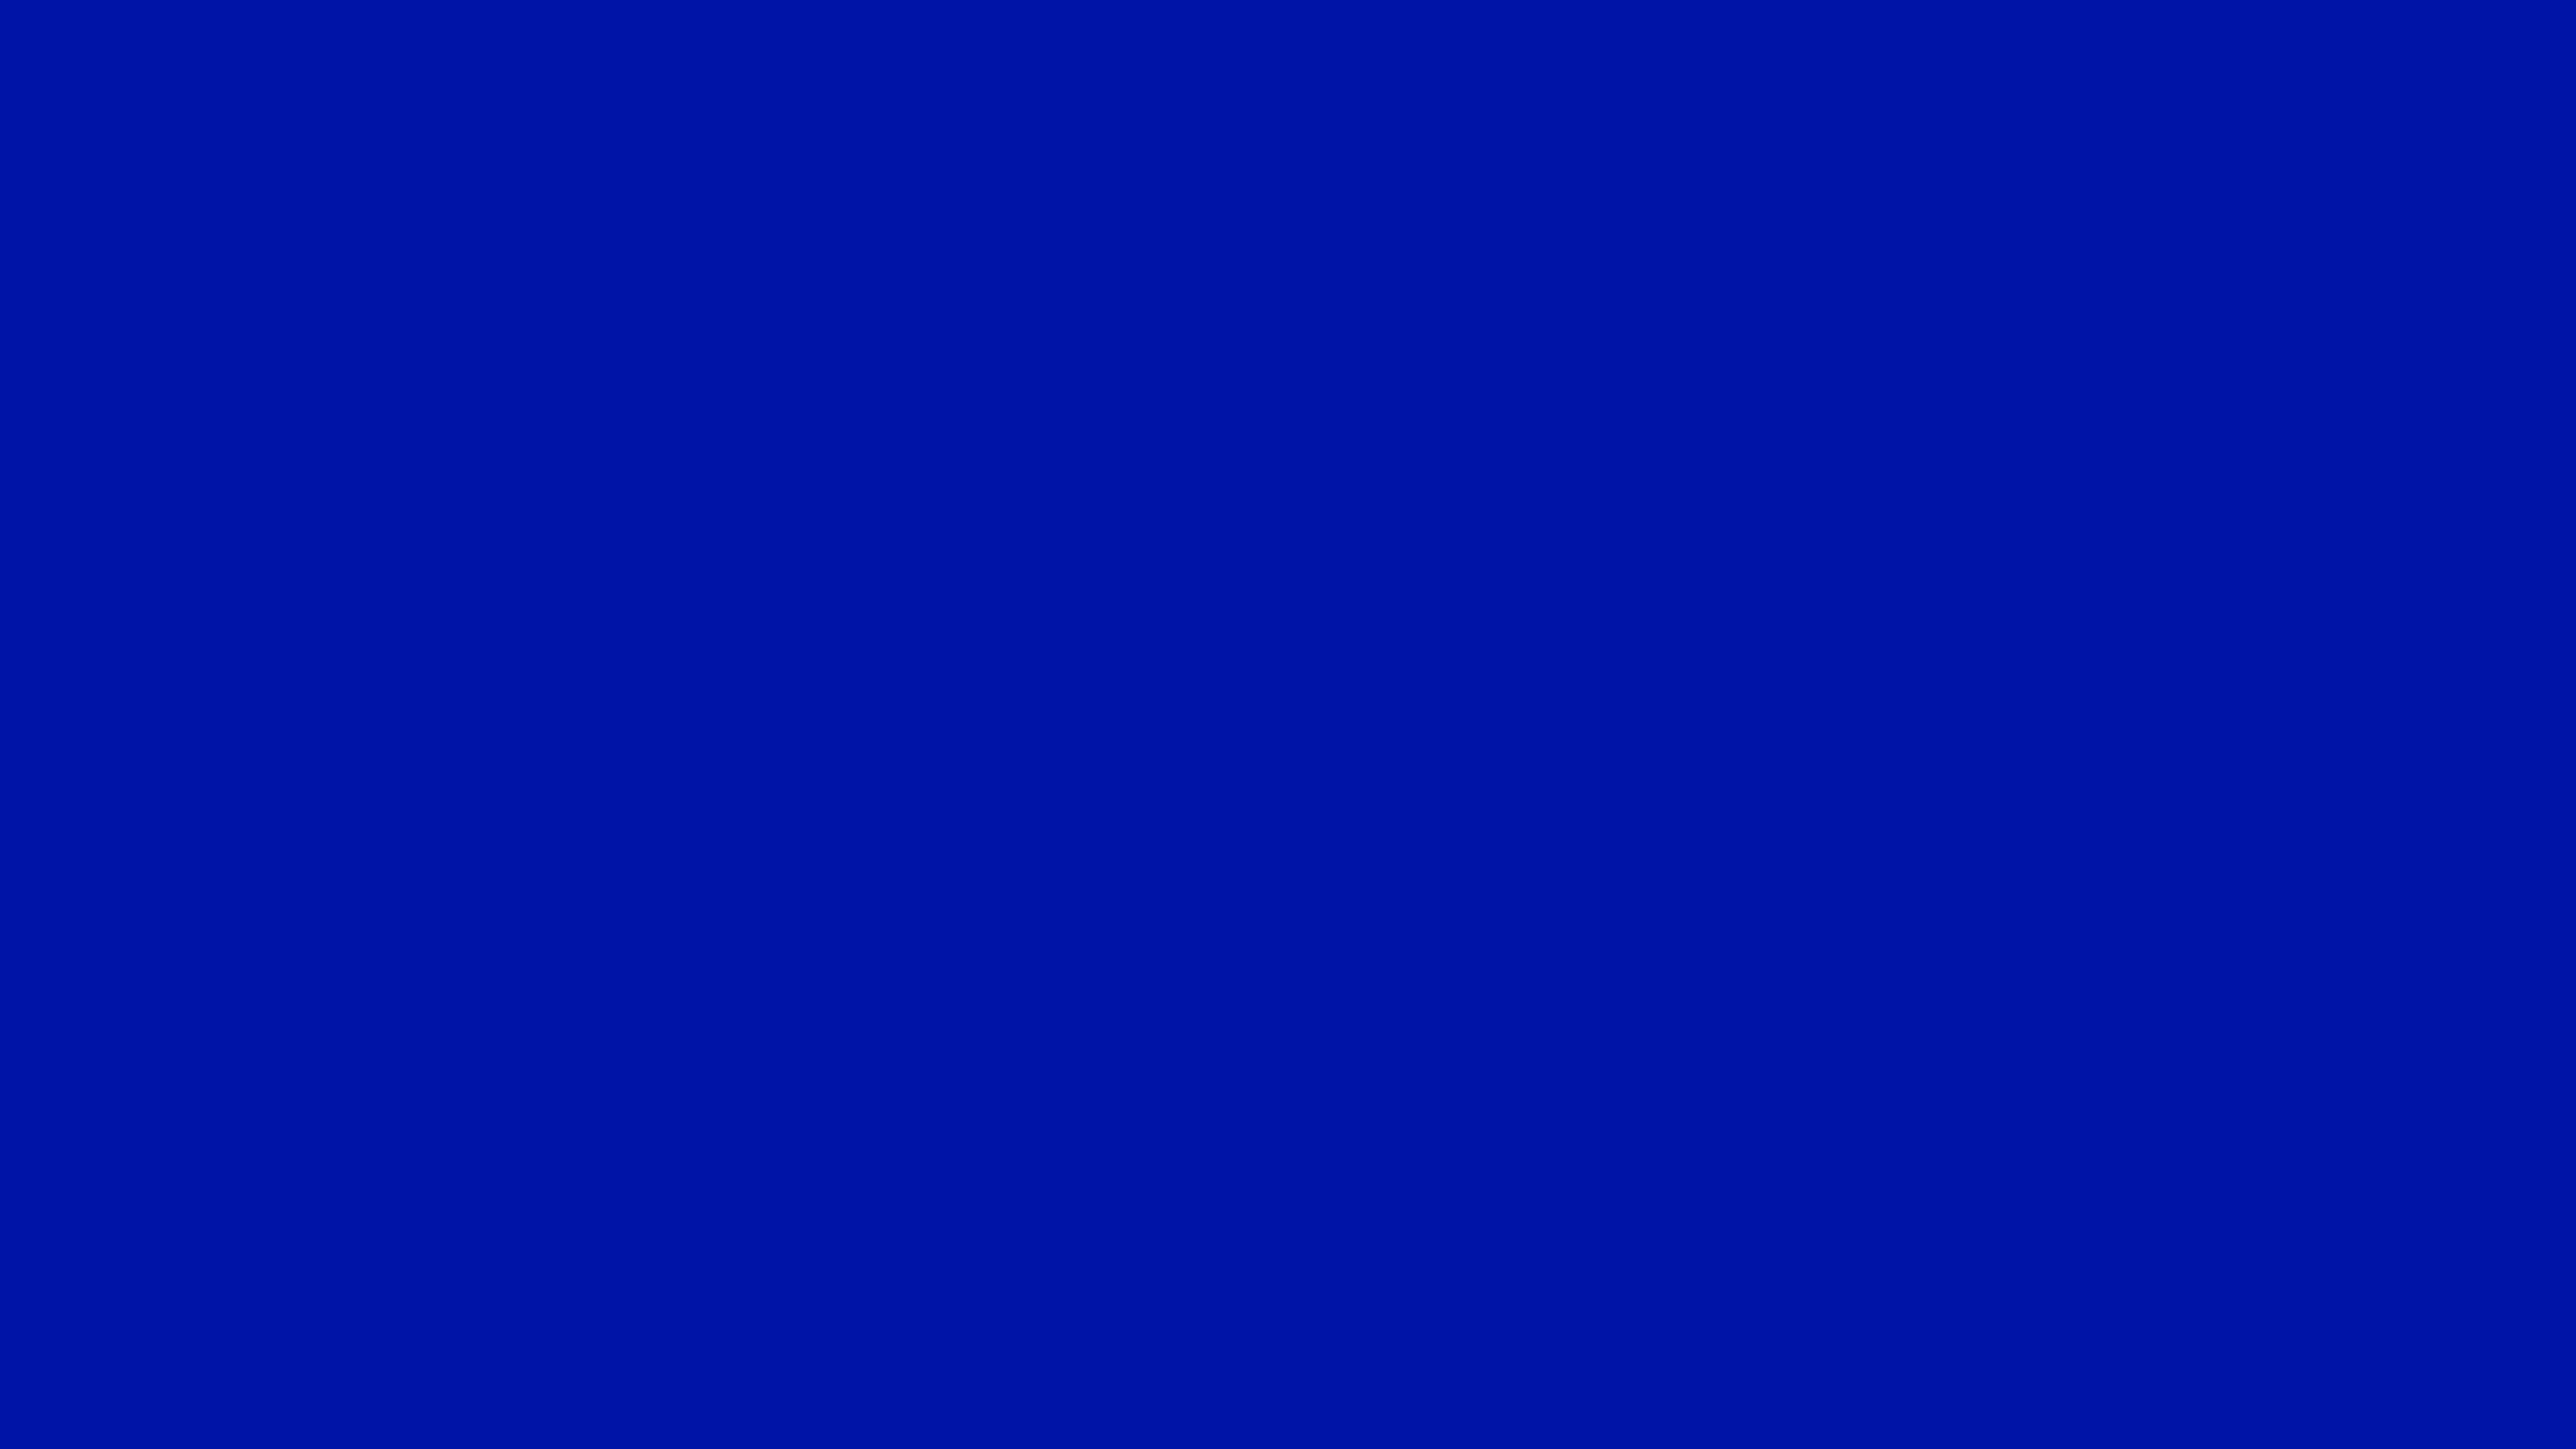 4096x2304 Zaffre Solid Color Background